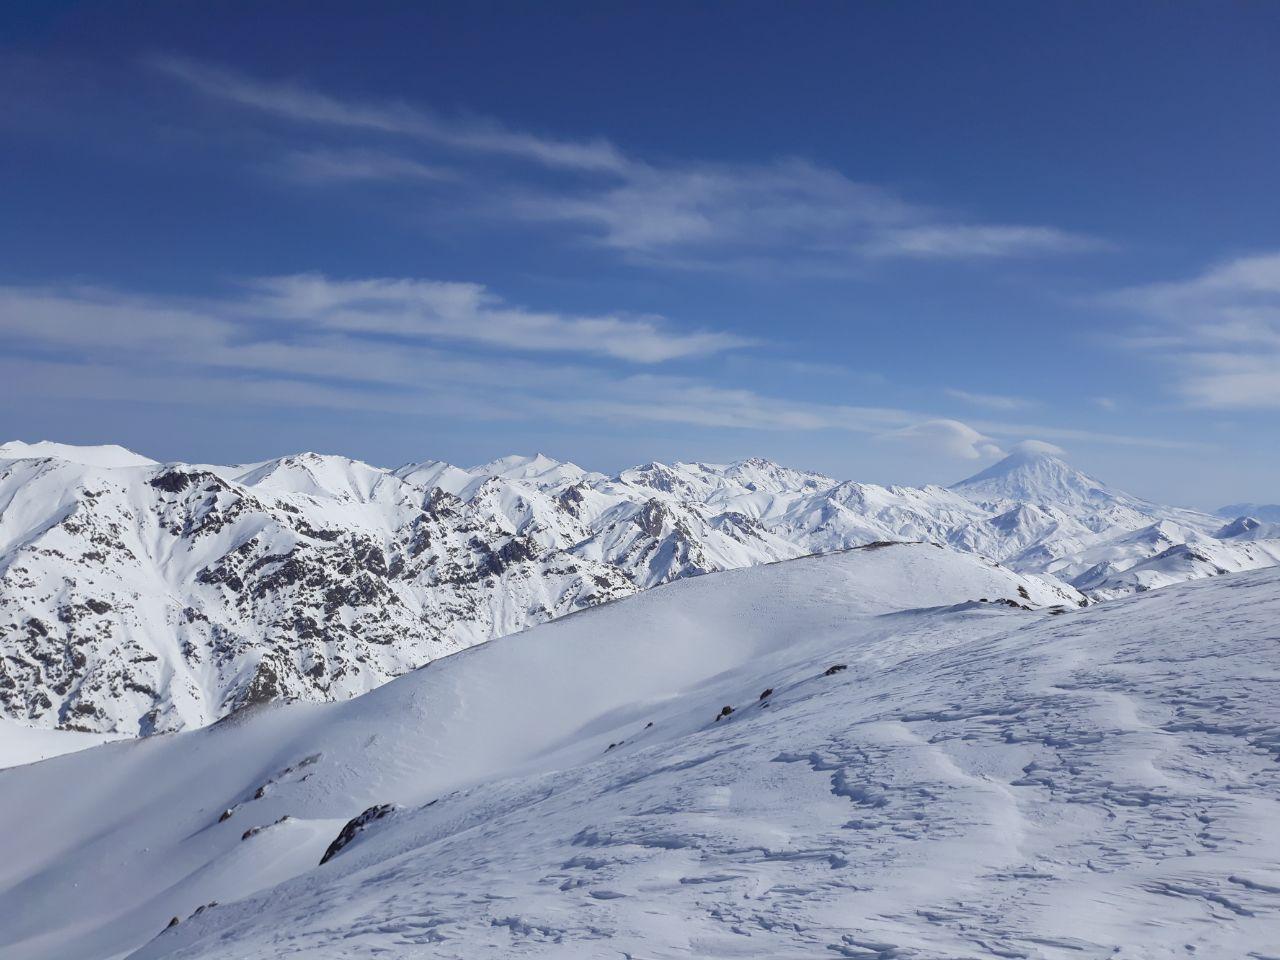 قله خرسنگ | عاشقان طبیعت ایران | صعود به قله خرسنگ جنوبی | خرسنگ شمالی